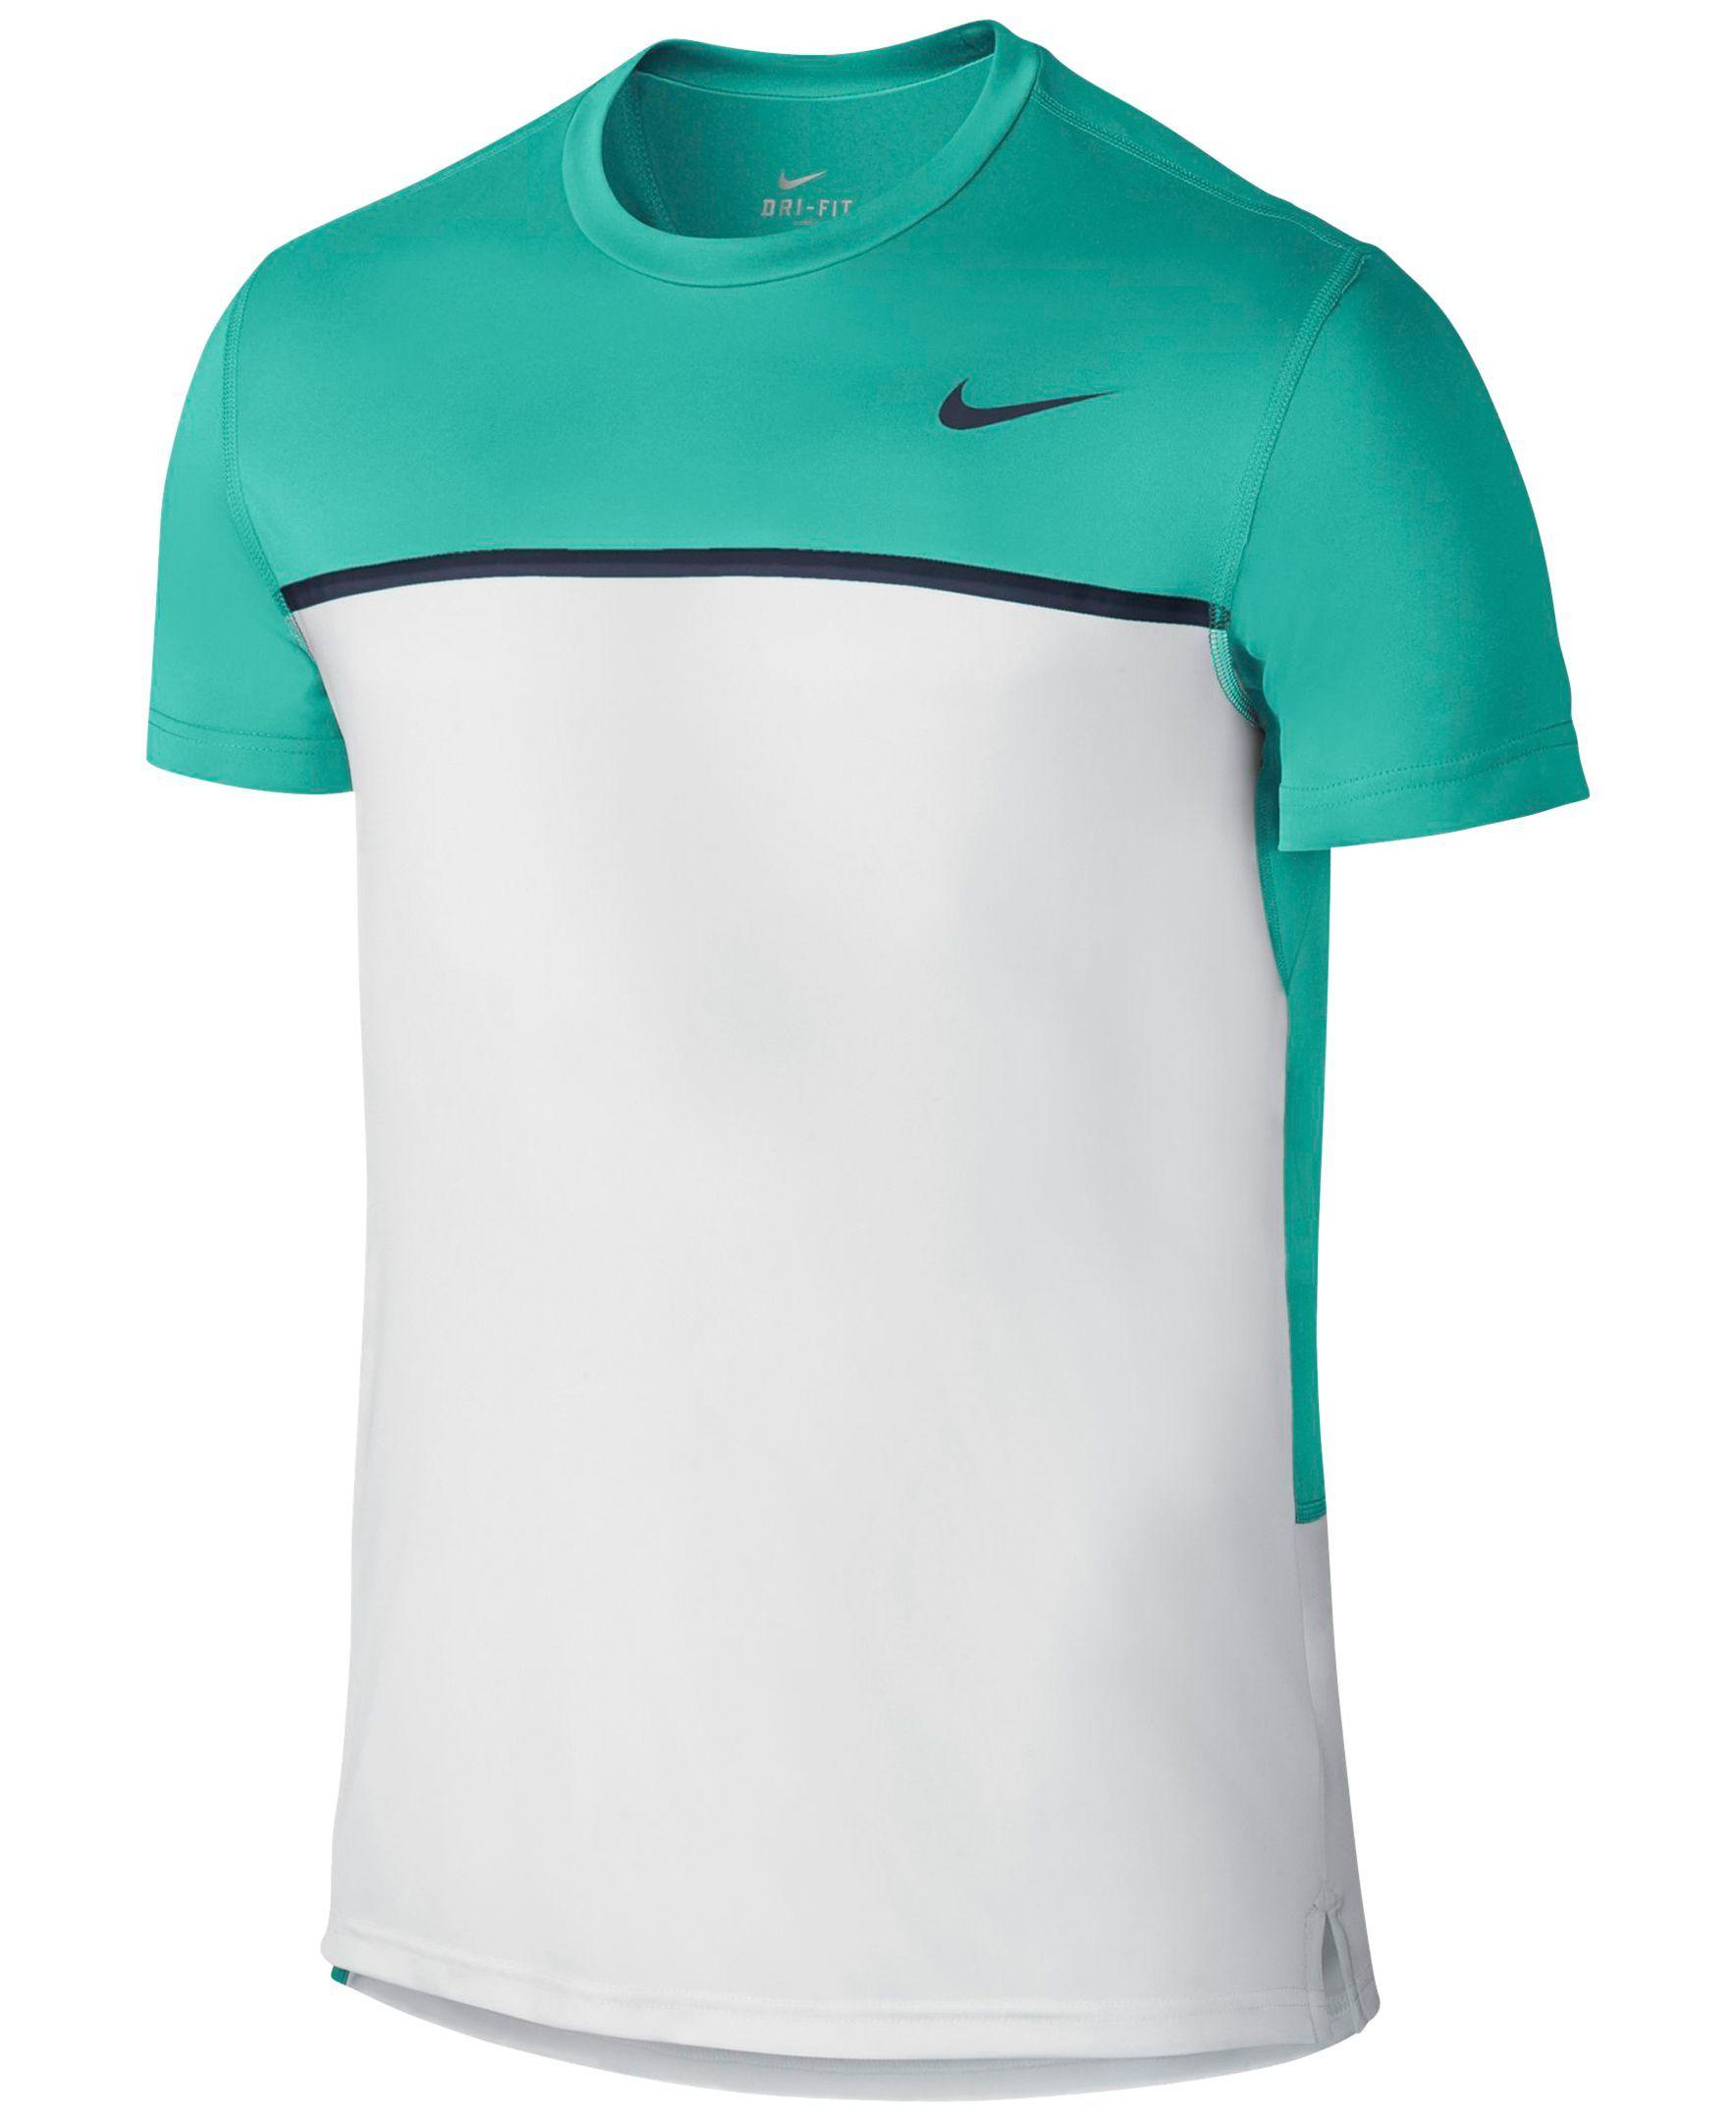 5c7e0858 Nike Challenger Crew Dri-fit T-Shirt | Workout Stuff in 2019 | Dri ...